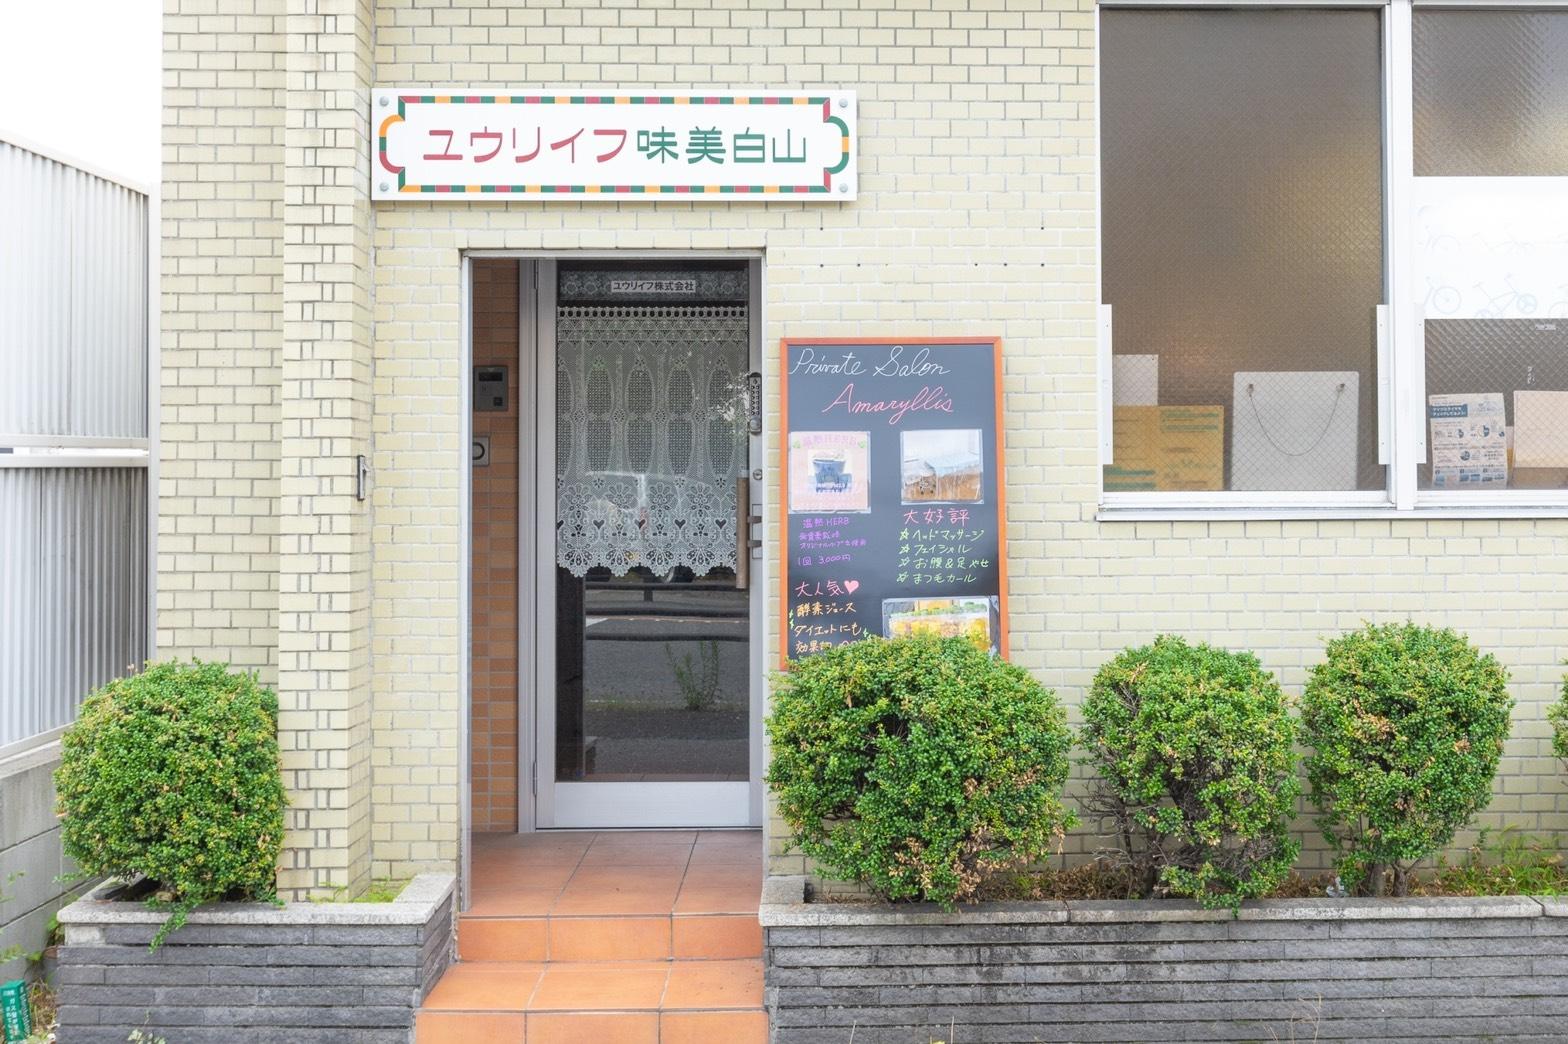 Private Salon Amaryllis